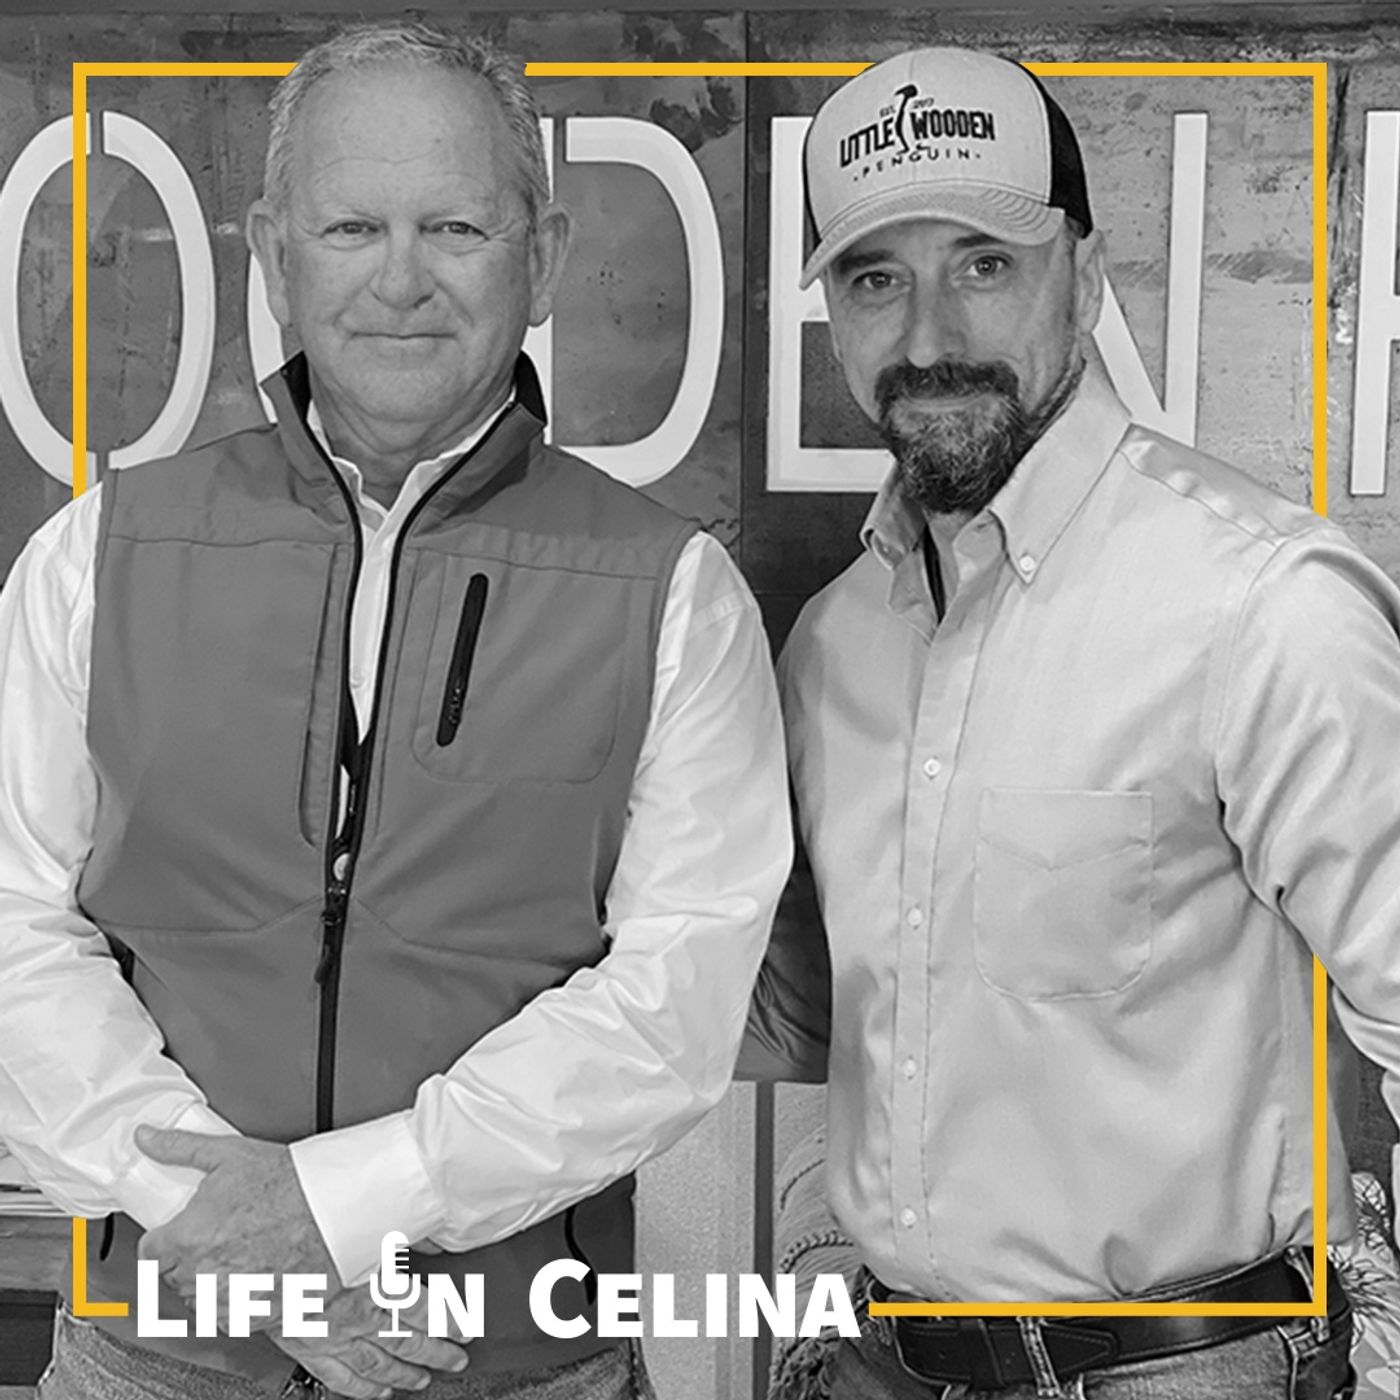 Chief Mark Metdker: On fire for Celina